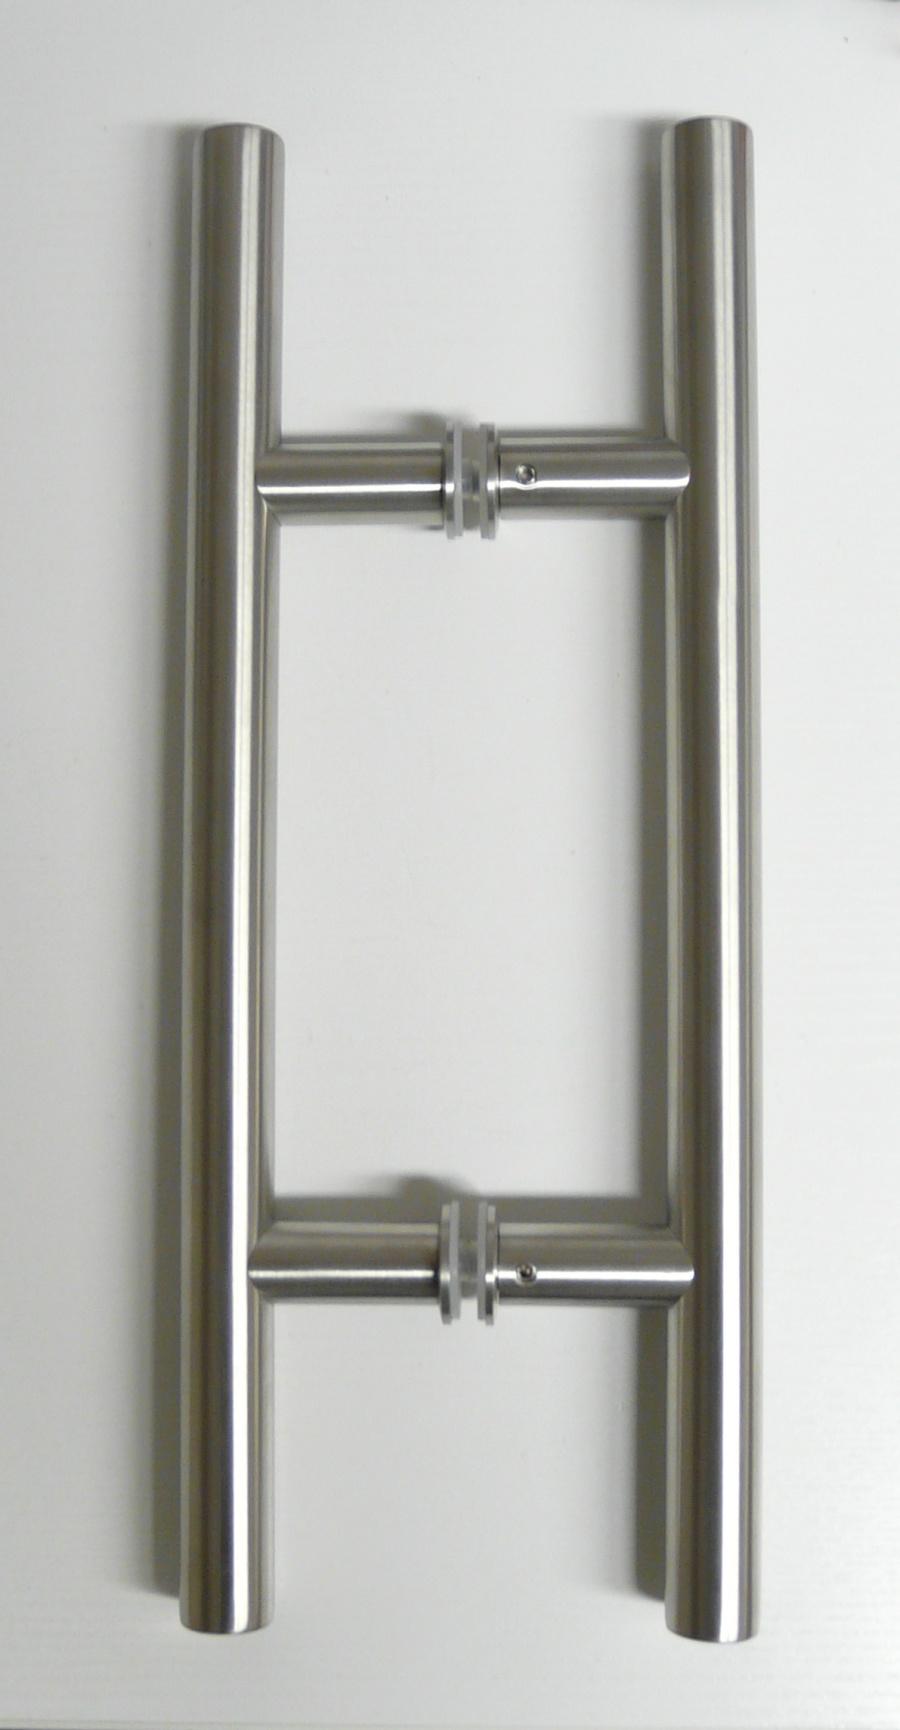 glasschiebet r sd716 2 alu60 2 fl gel satinato griffstangen edelstahl ebay. Black Bedroom Furniture Sets. Home Design Ideas